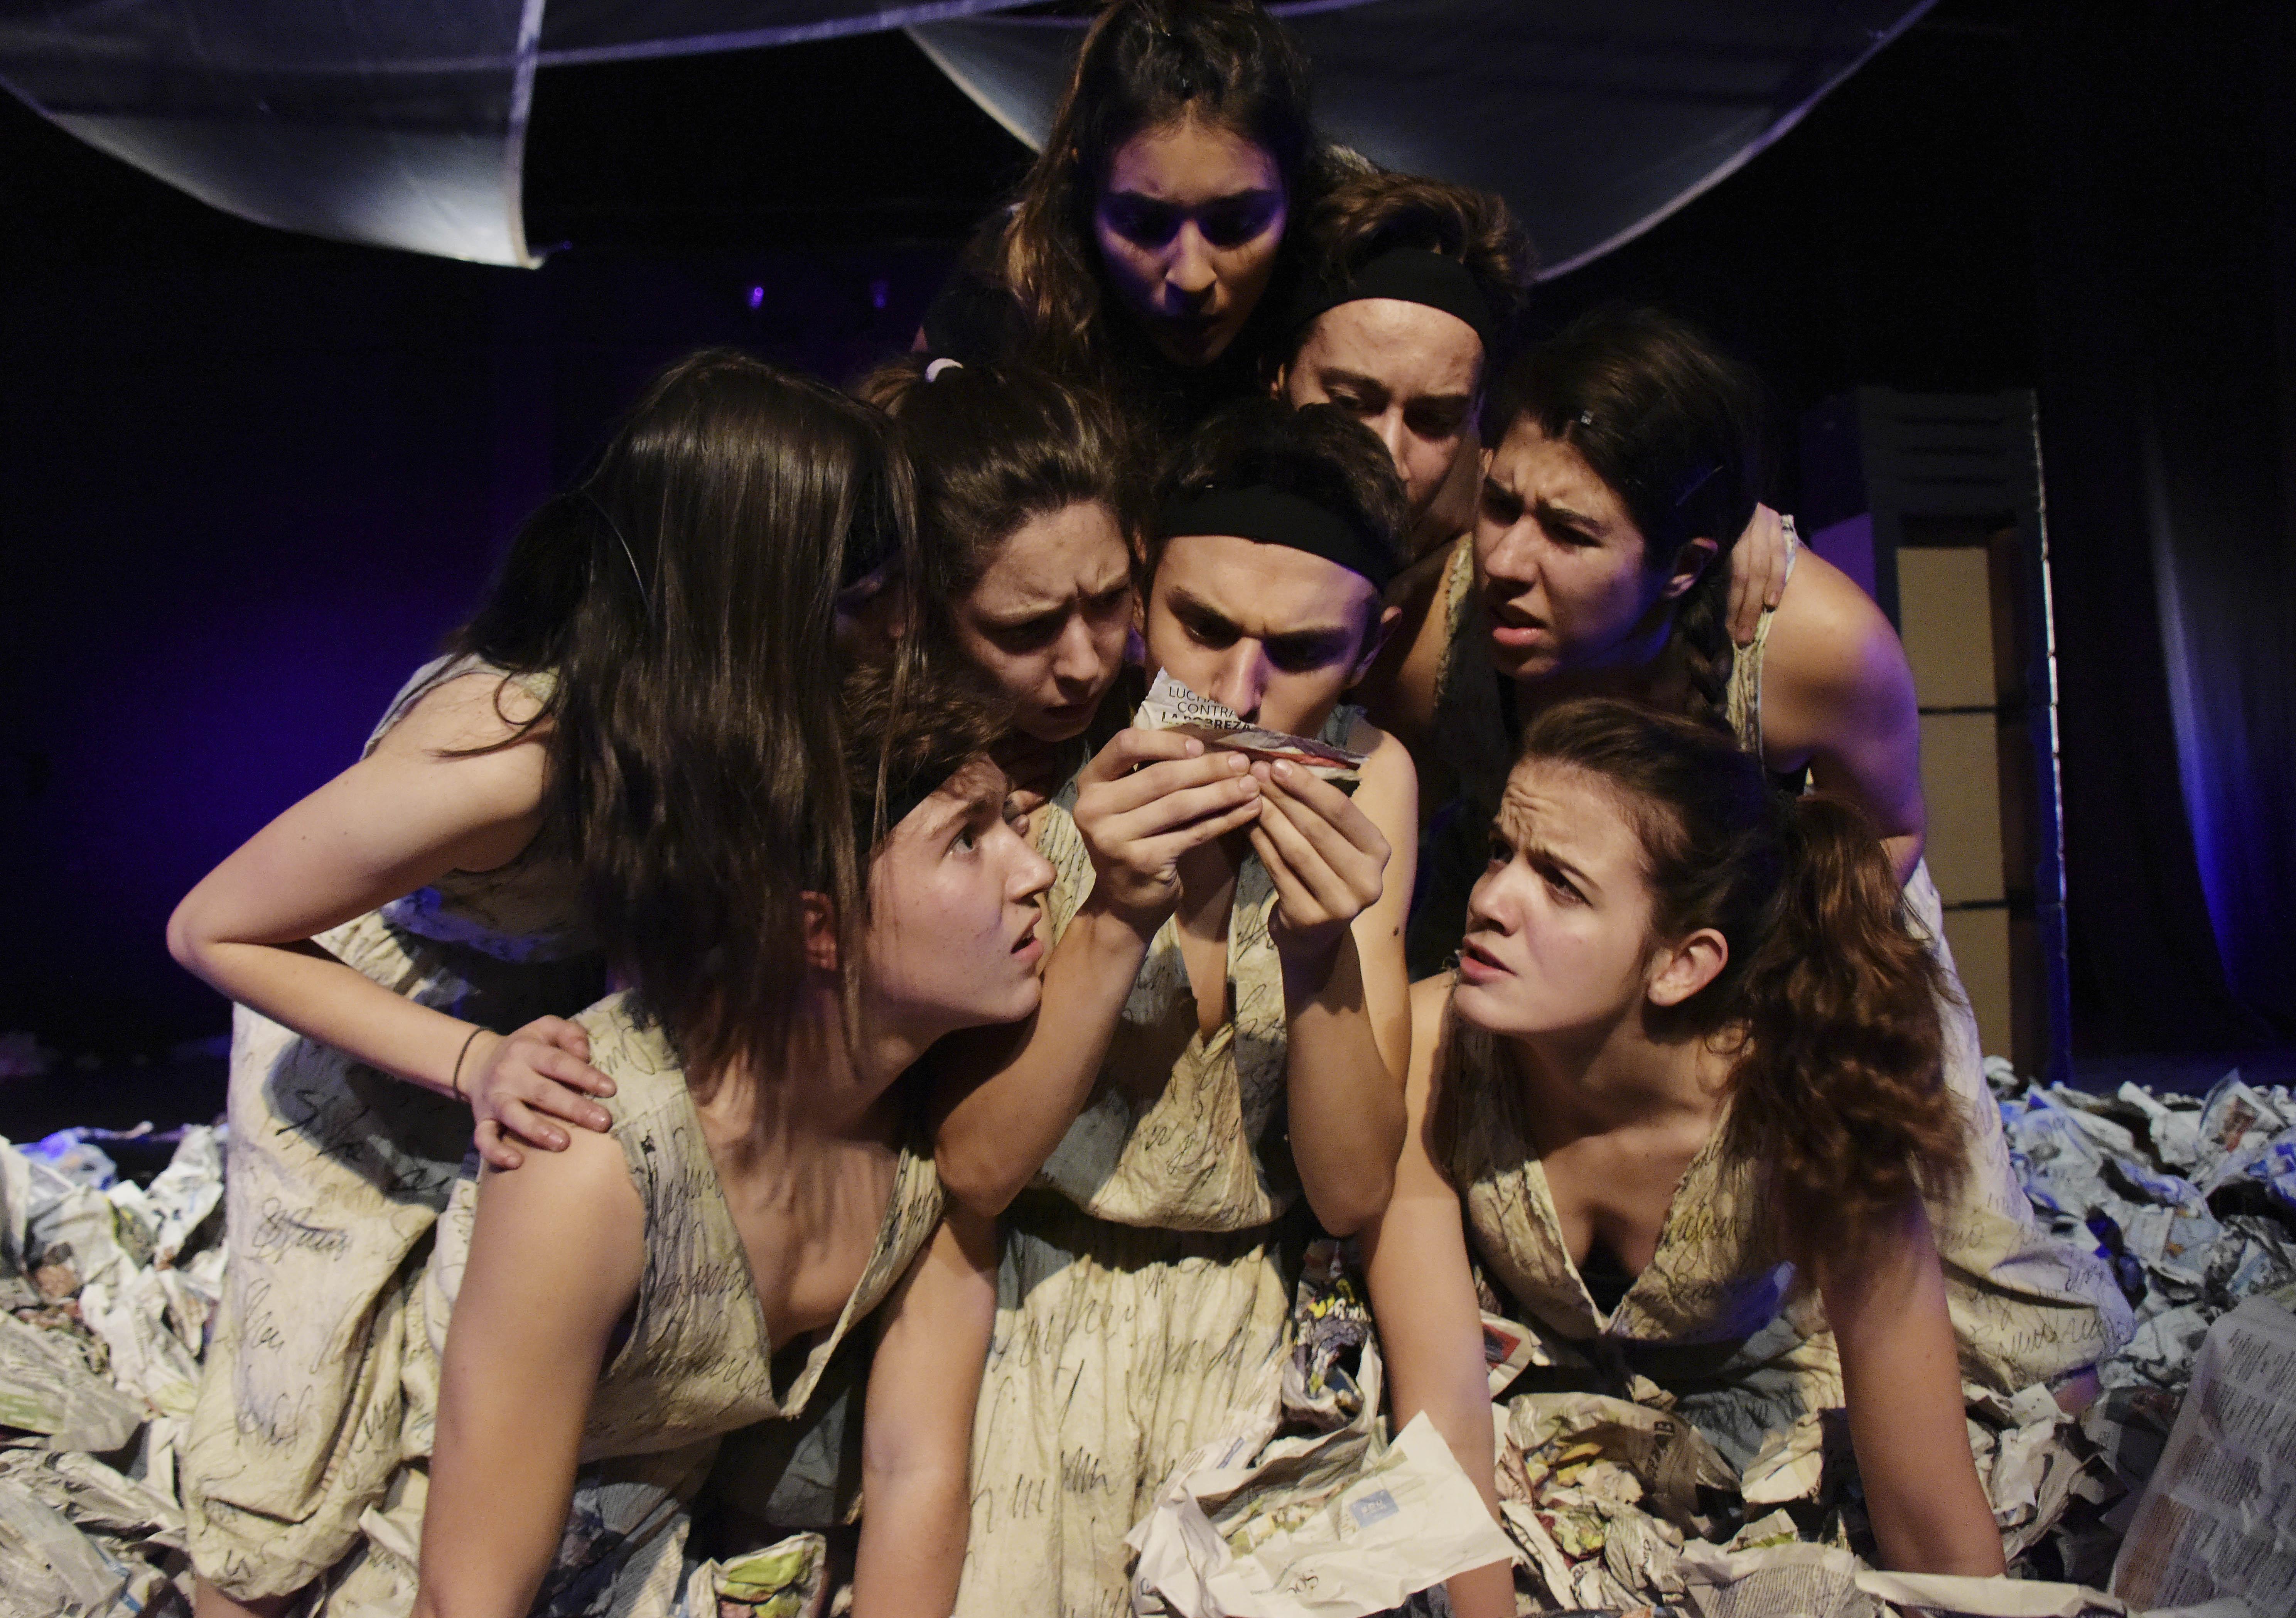 La Inestable 21 (Aula municipal de Teatre de Lleida)